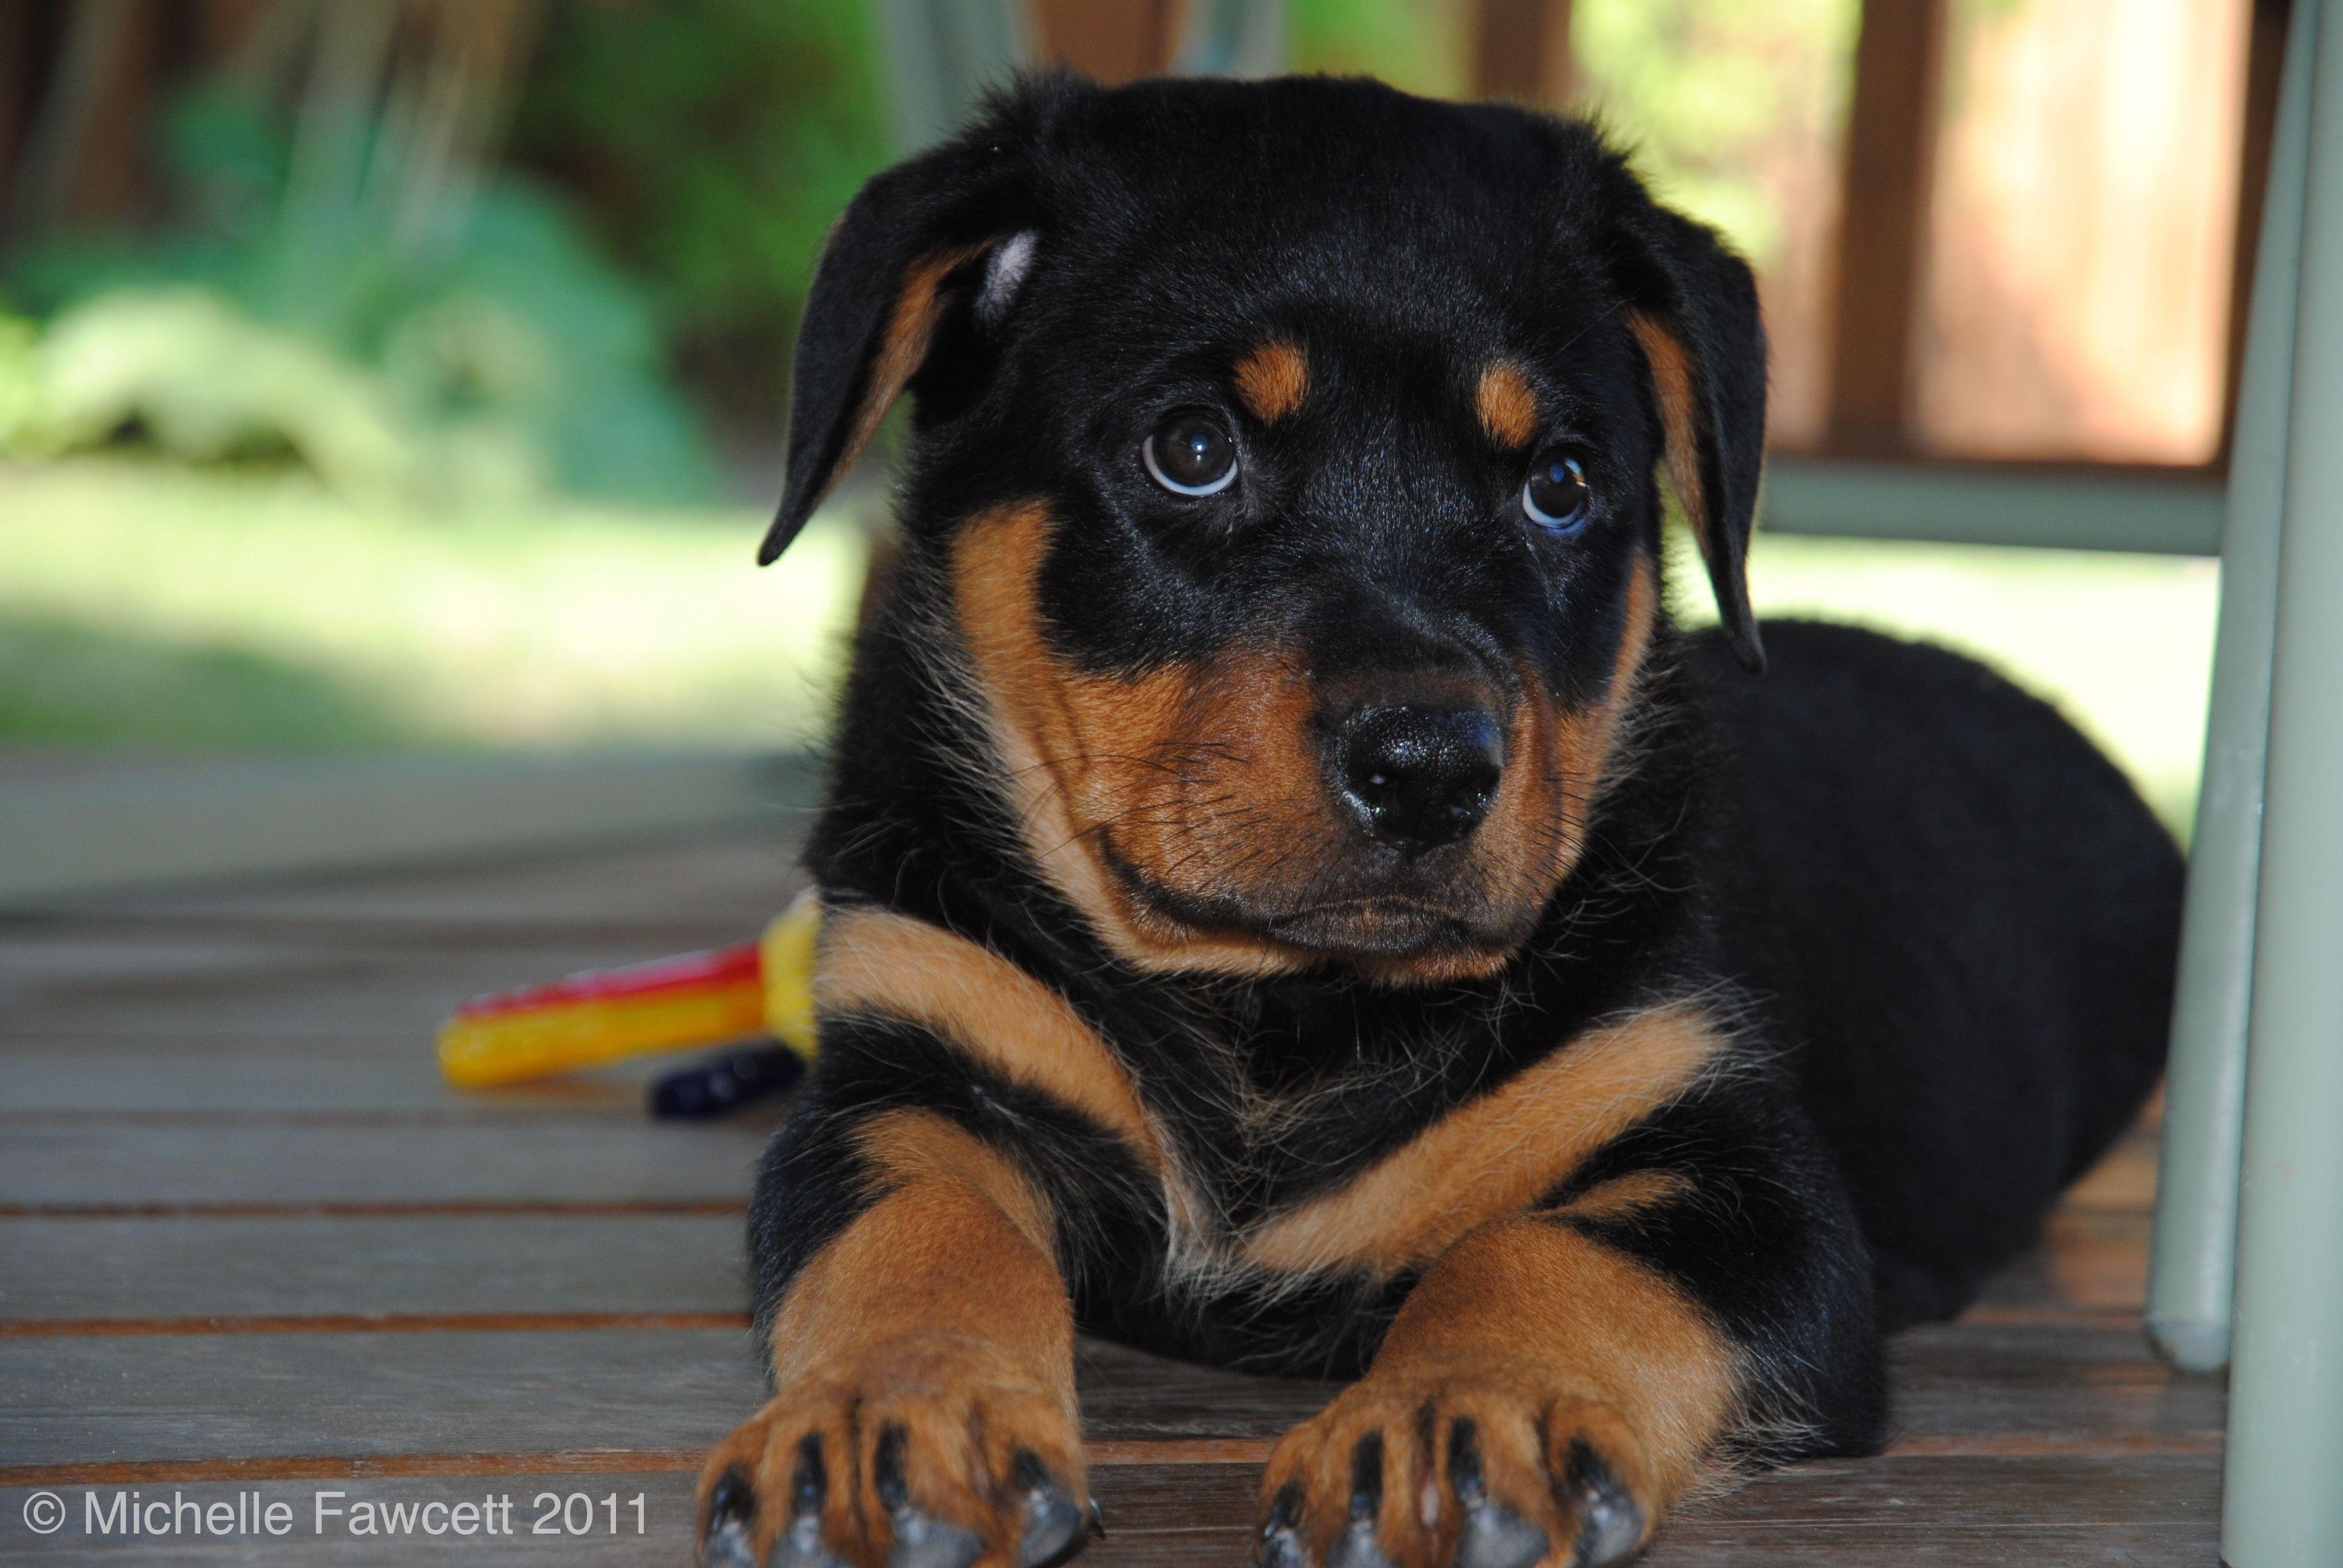 Cute Doggo Baby Boop Weargordon Gordonwear Petaccessories Pets Dogleashes Dogs Cute Adorable Do Rottweiler Puppies Rottweiler Love Rottweiler Training